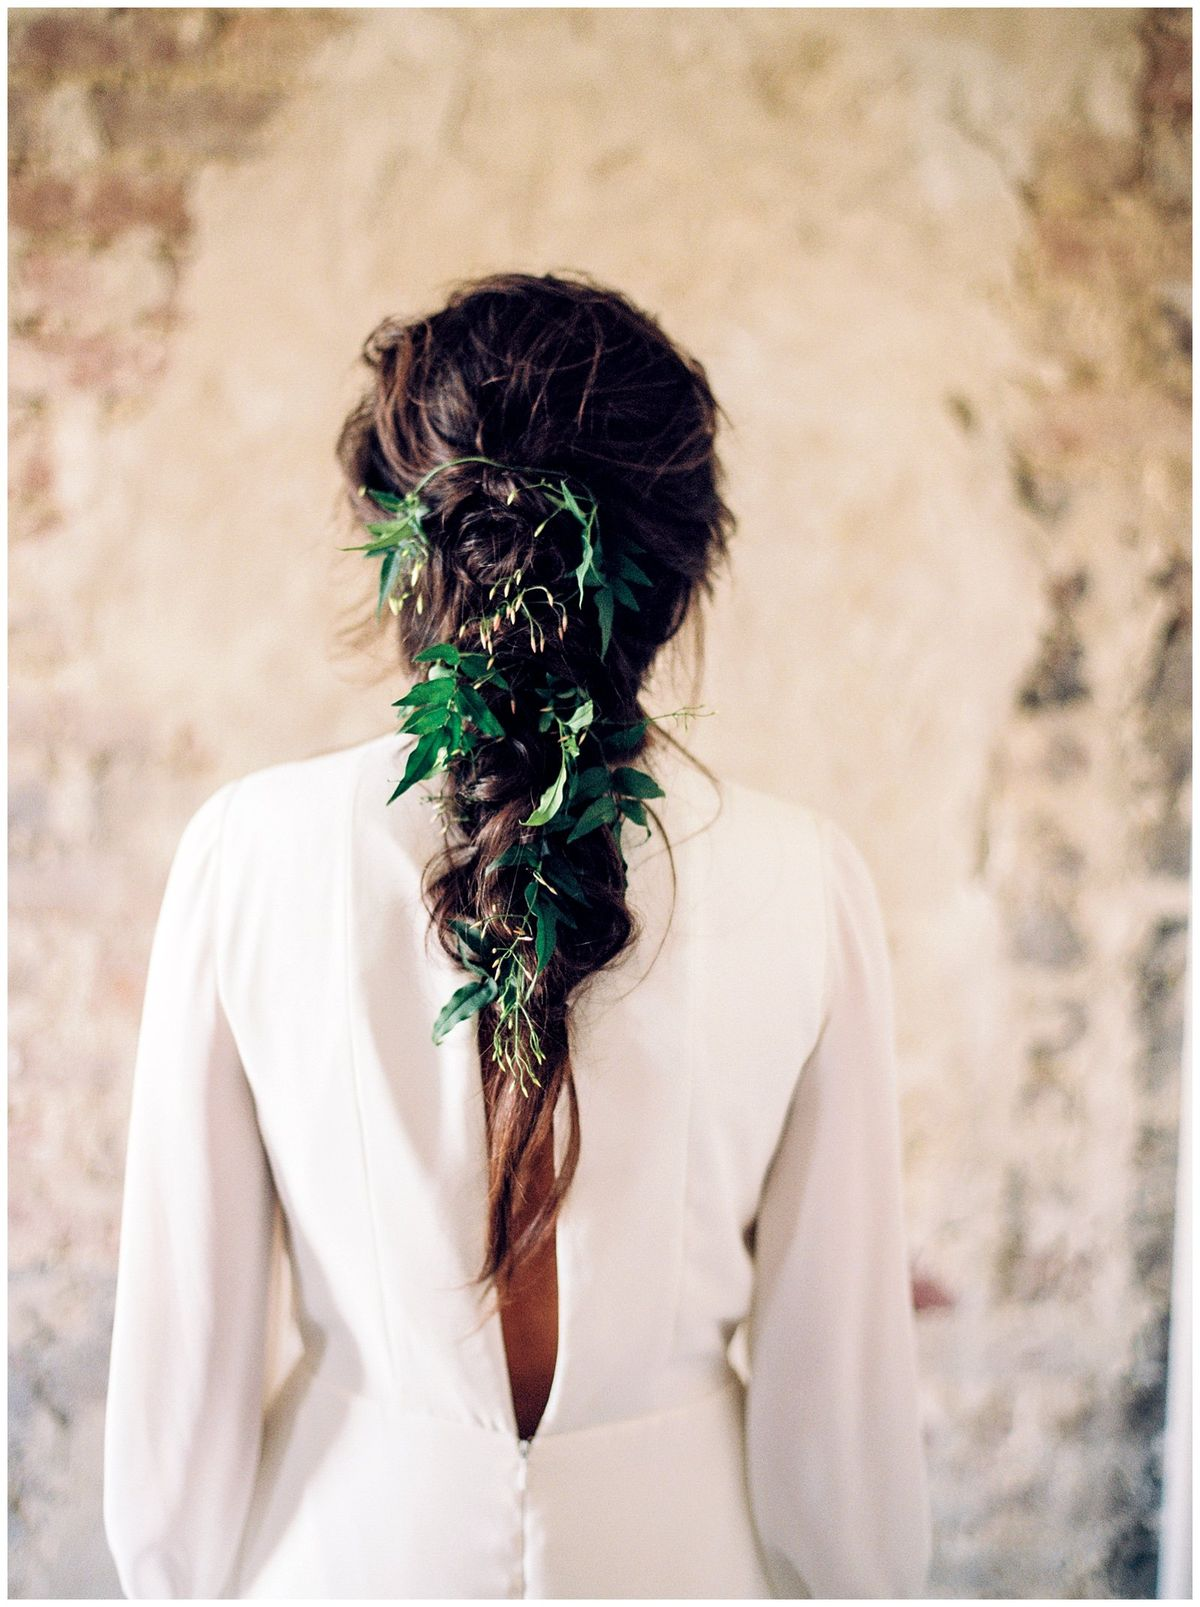 Bridal braid with greenery || The ganeys